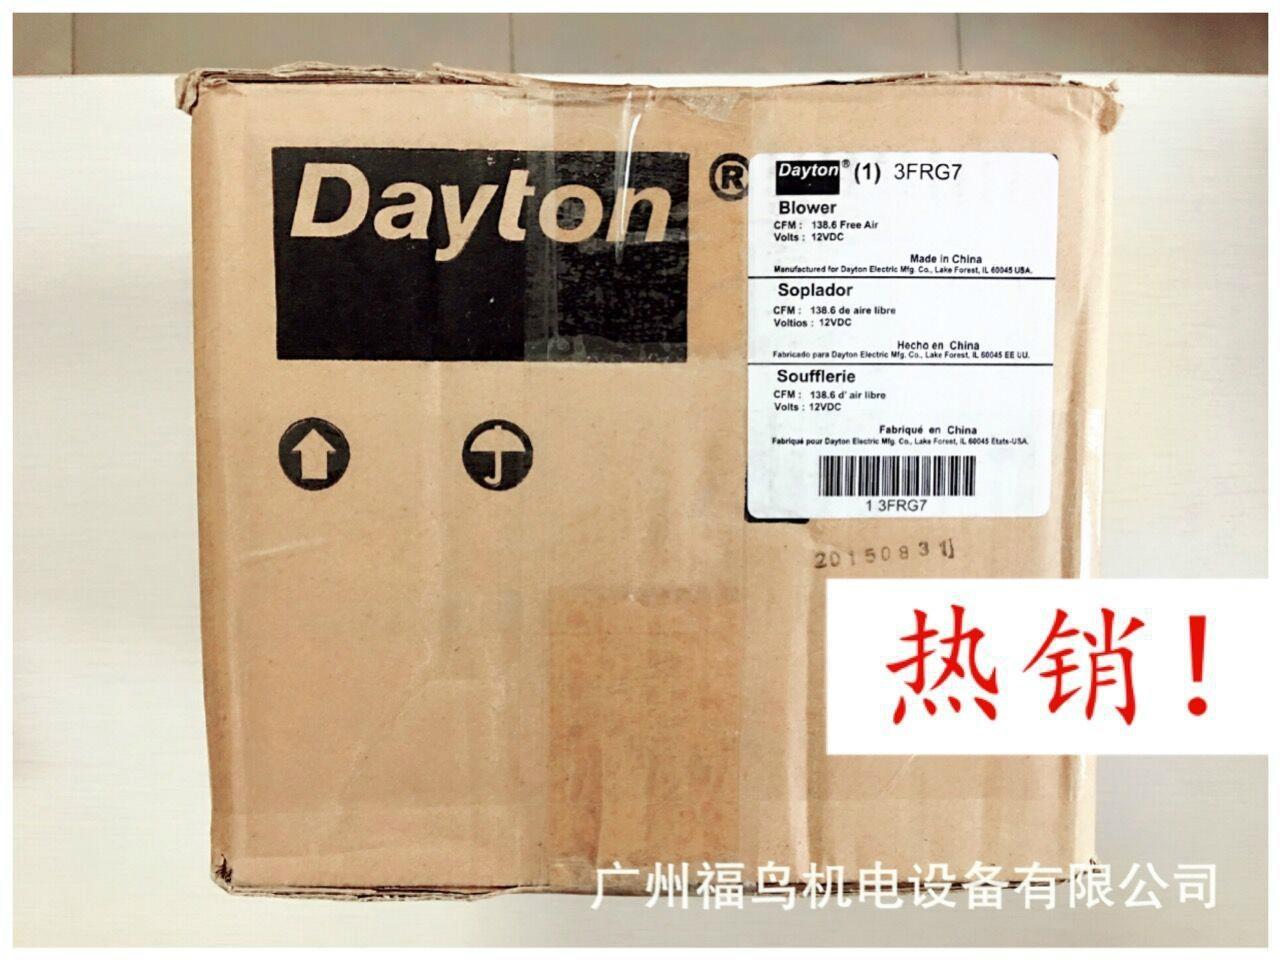 DAYTON風機, 型號: 3FRG7